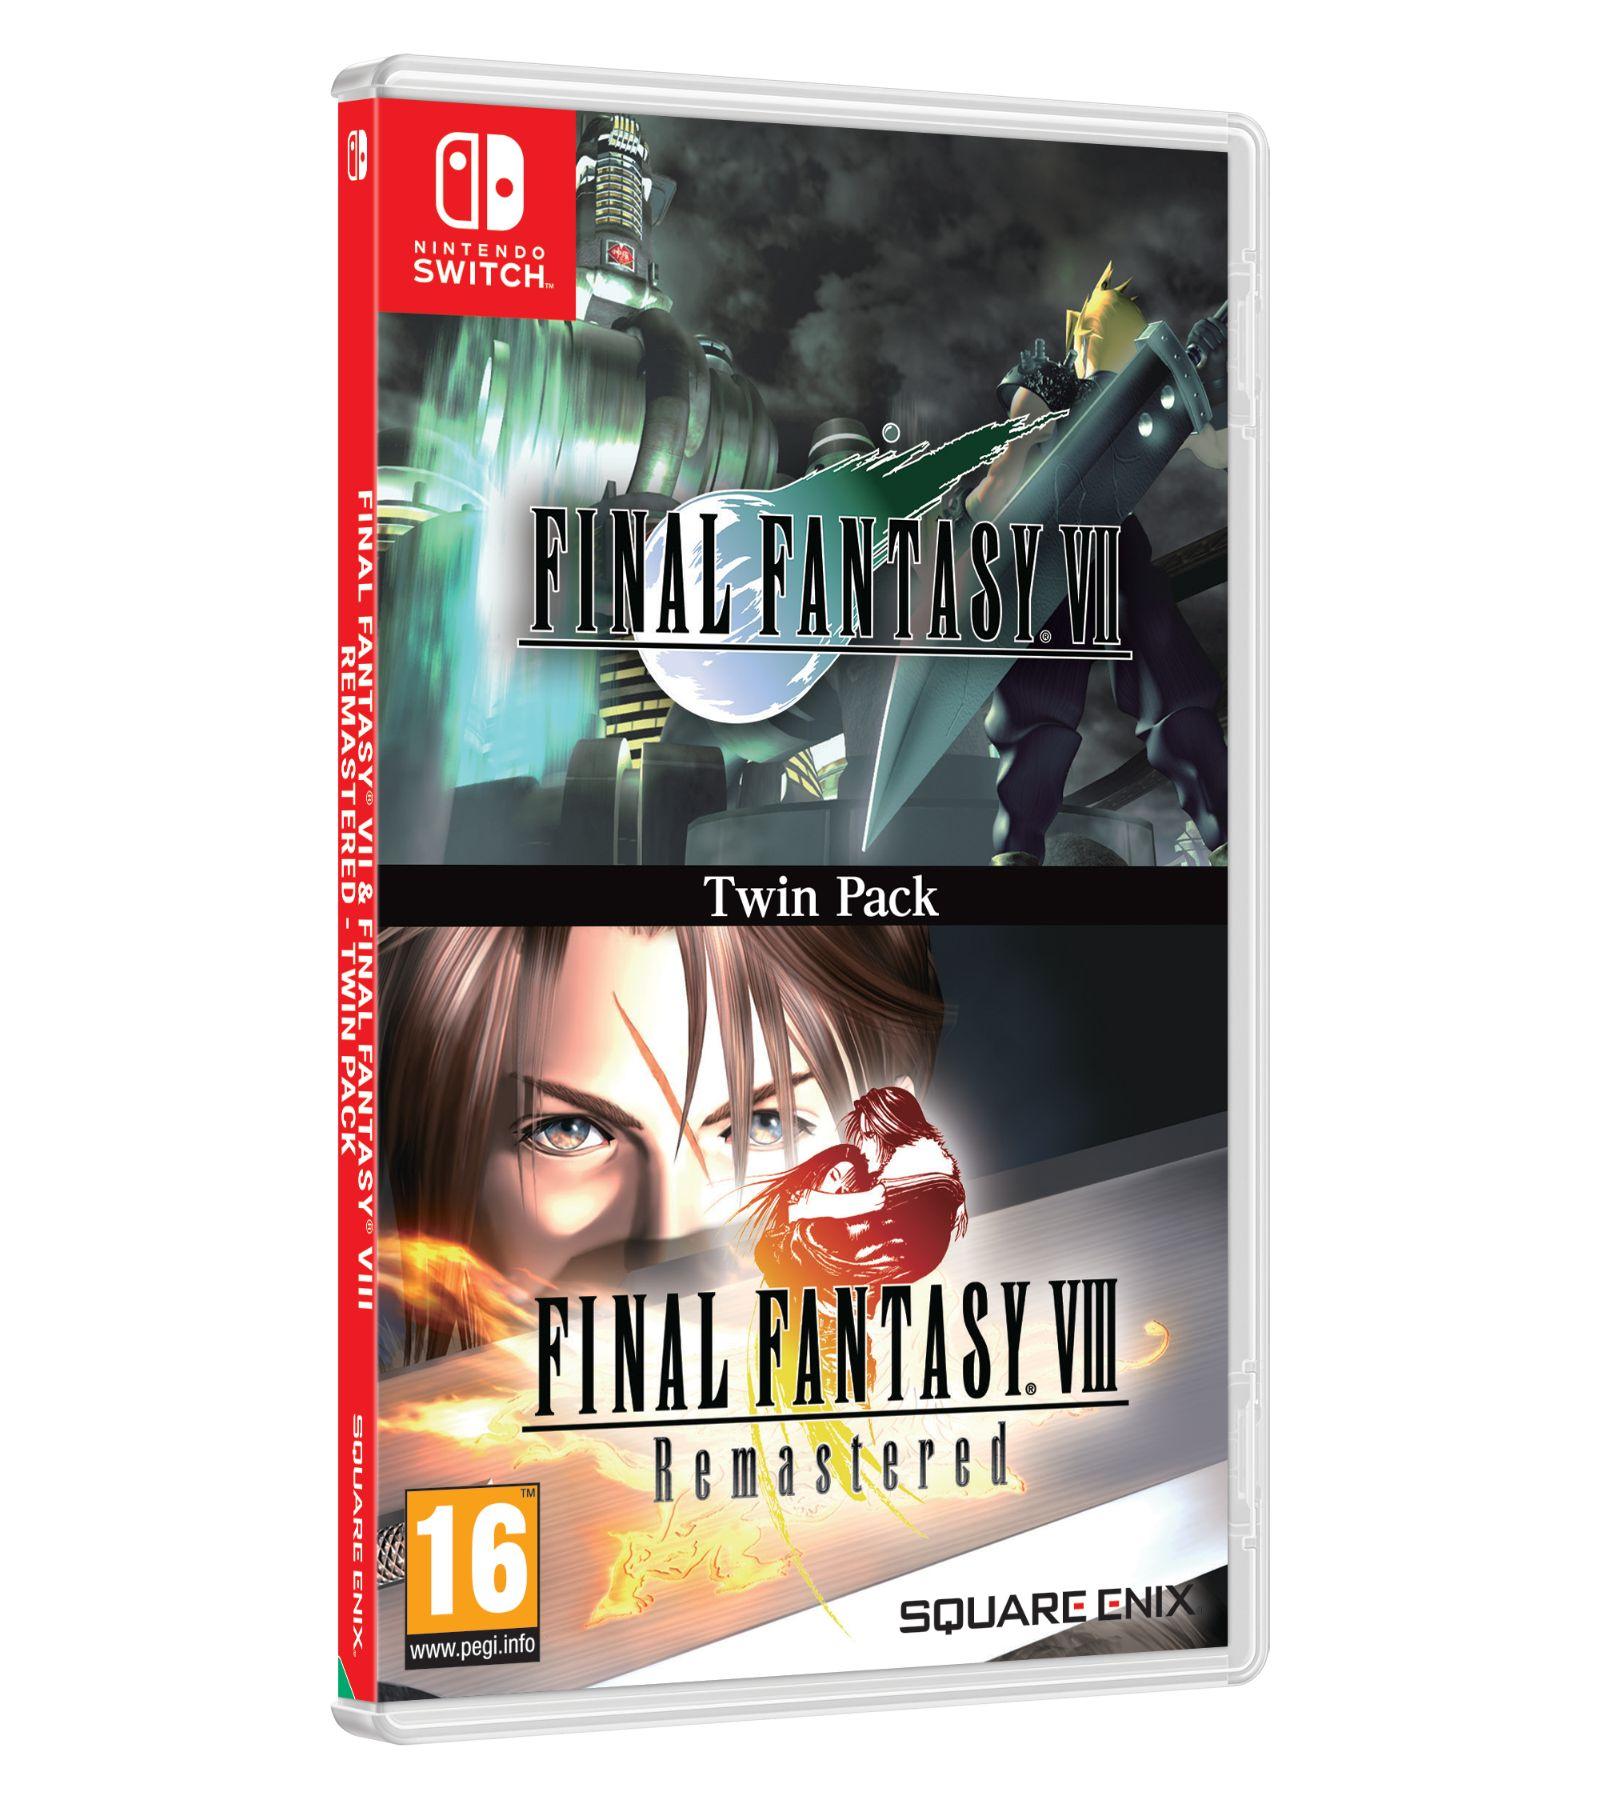 Final Fantasy VII & Final Fantasy VIII Remastered Double Pack